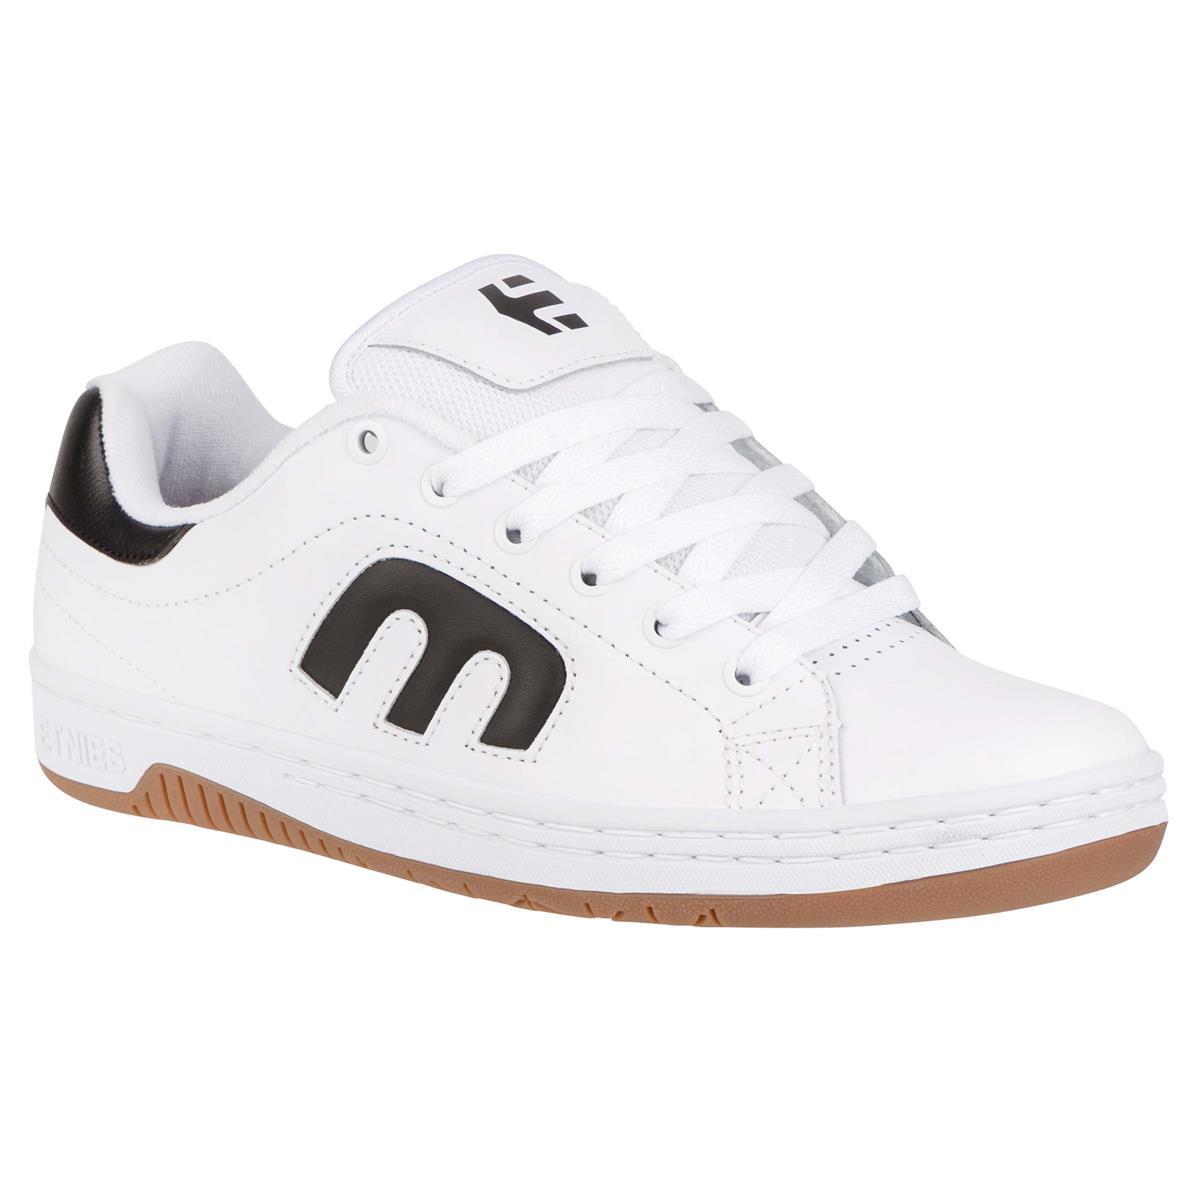 Etnies Shoes Calli Cut White/Black/Gum